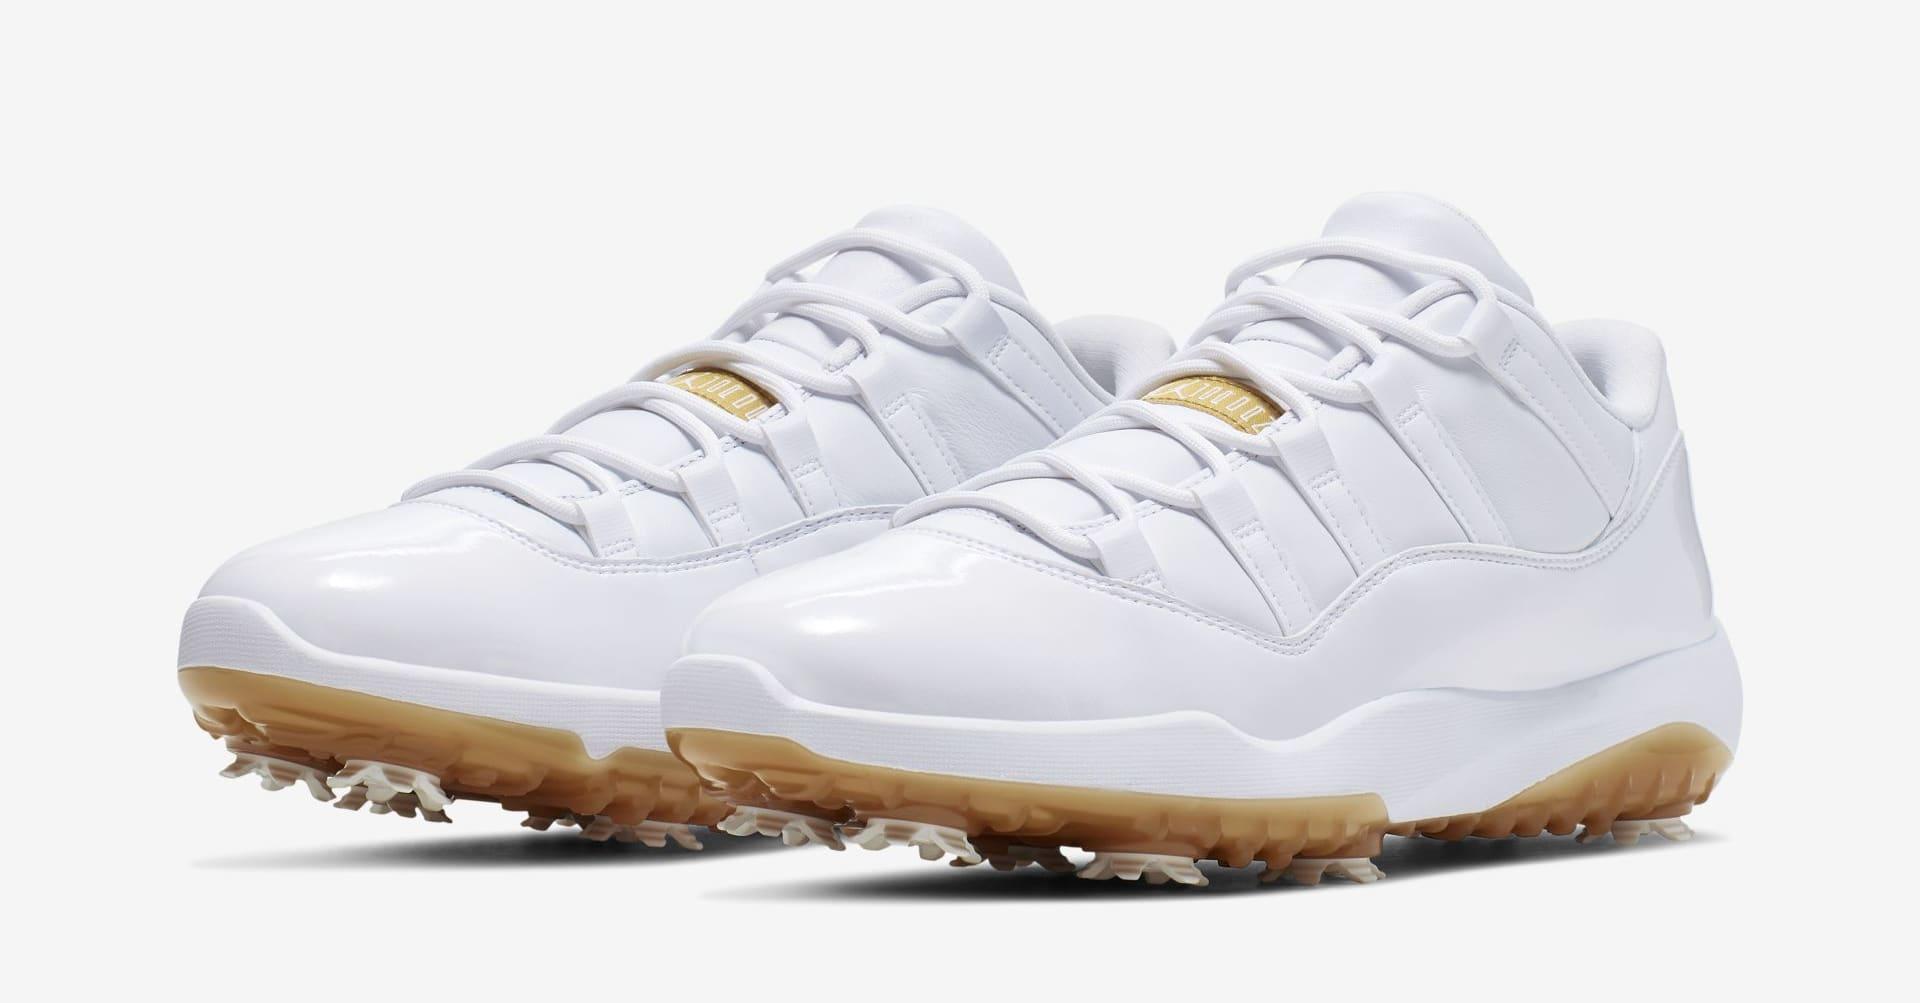 size 40 adac4 22e5d Air Jordan 11 Low Golf 'White/Metallic Gold' Release Date ...